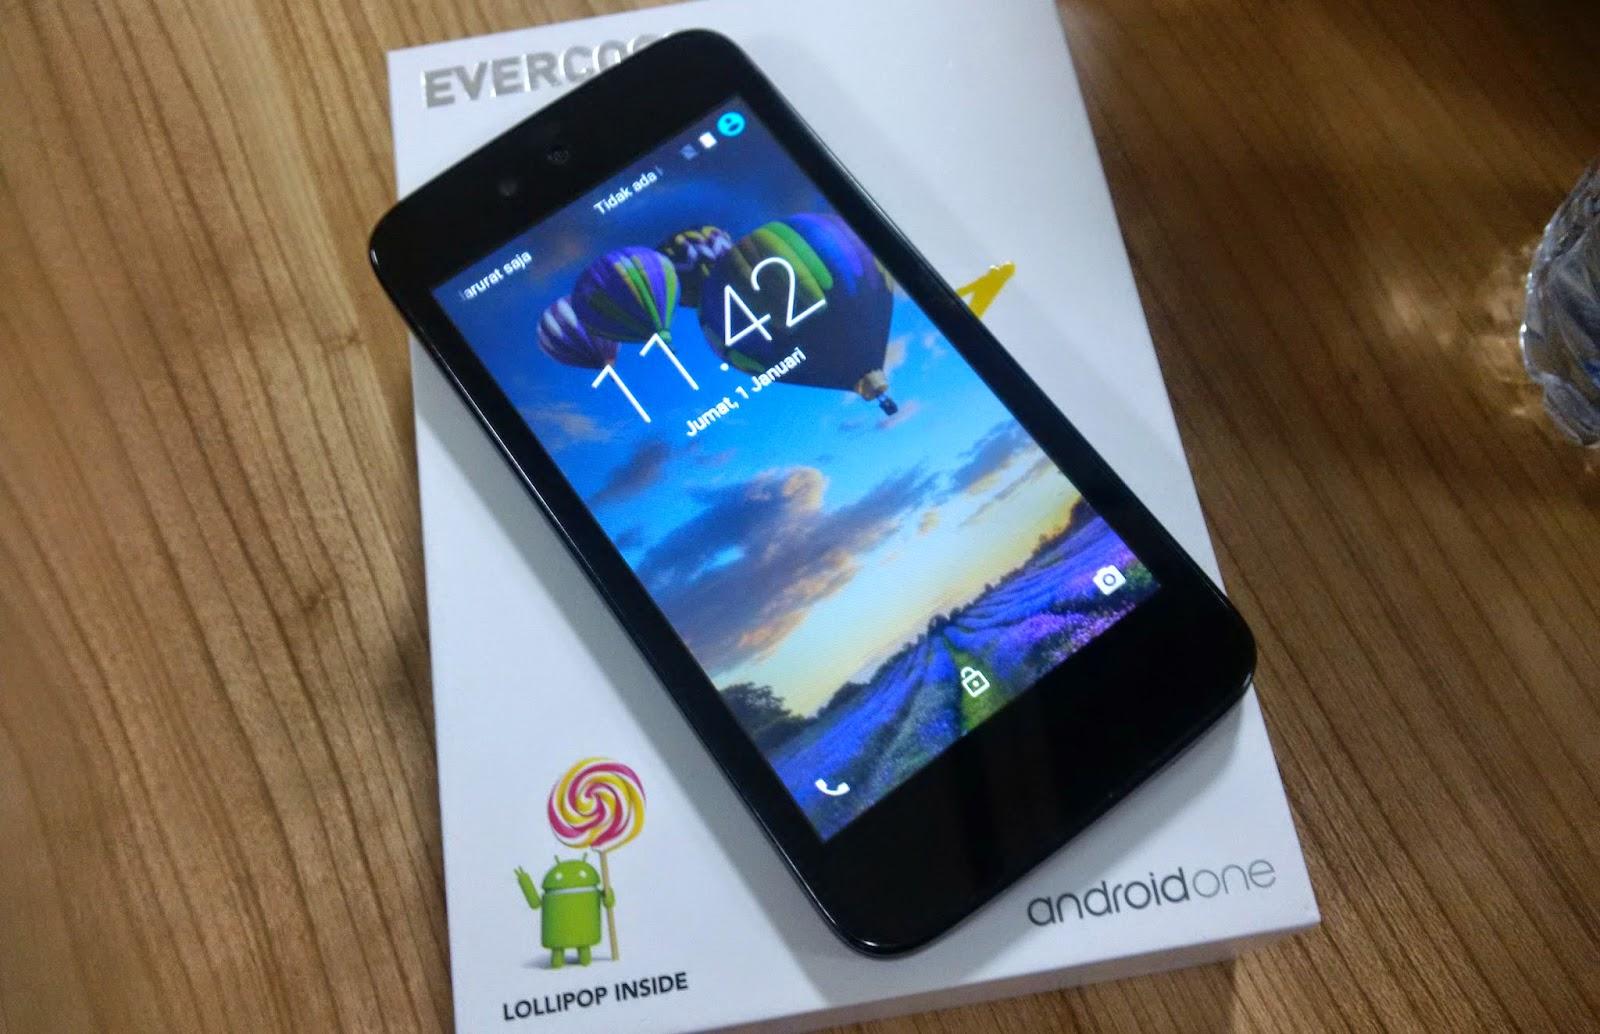 Spesifikasi dan Harga Android One Evercross One X